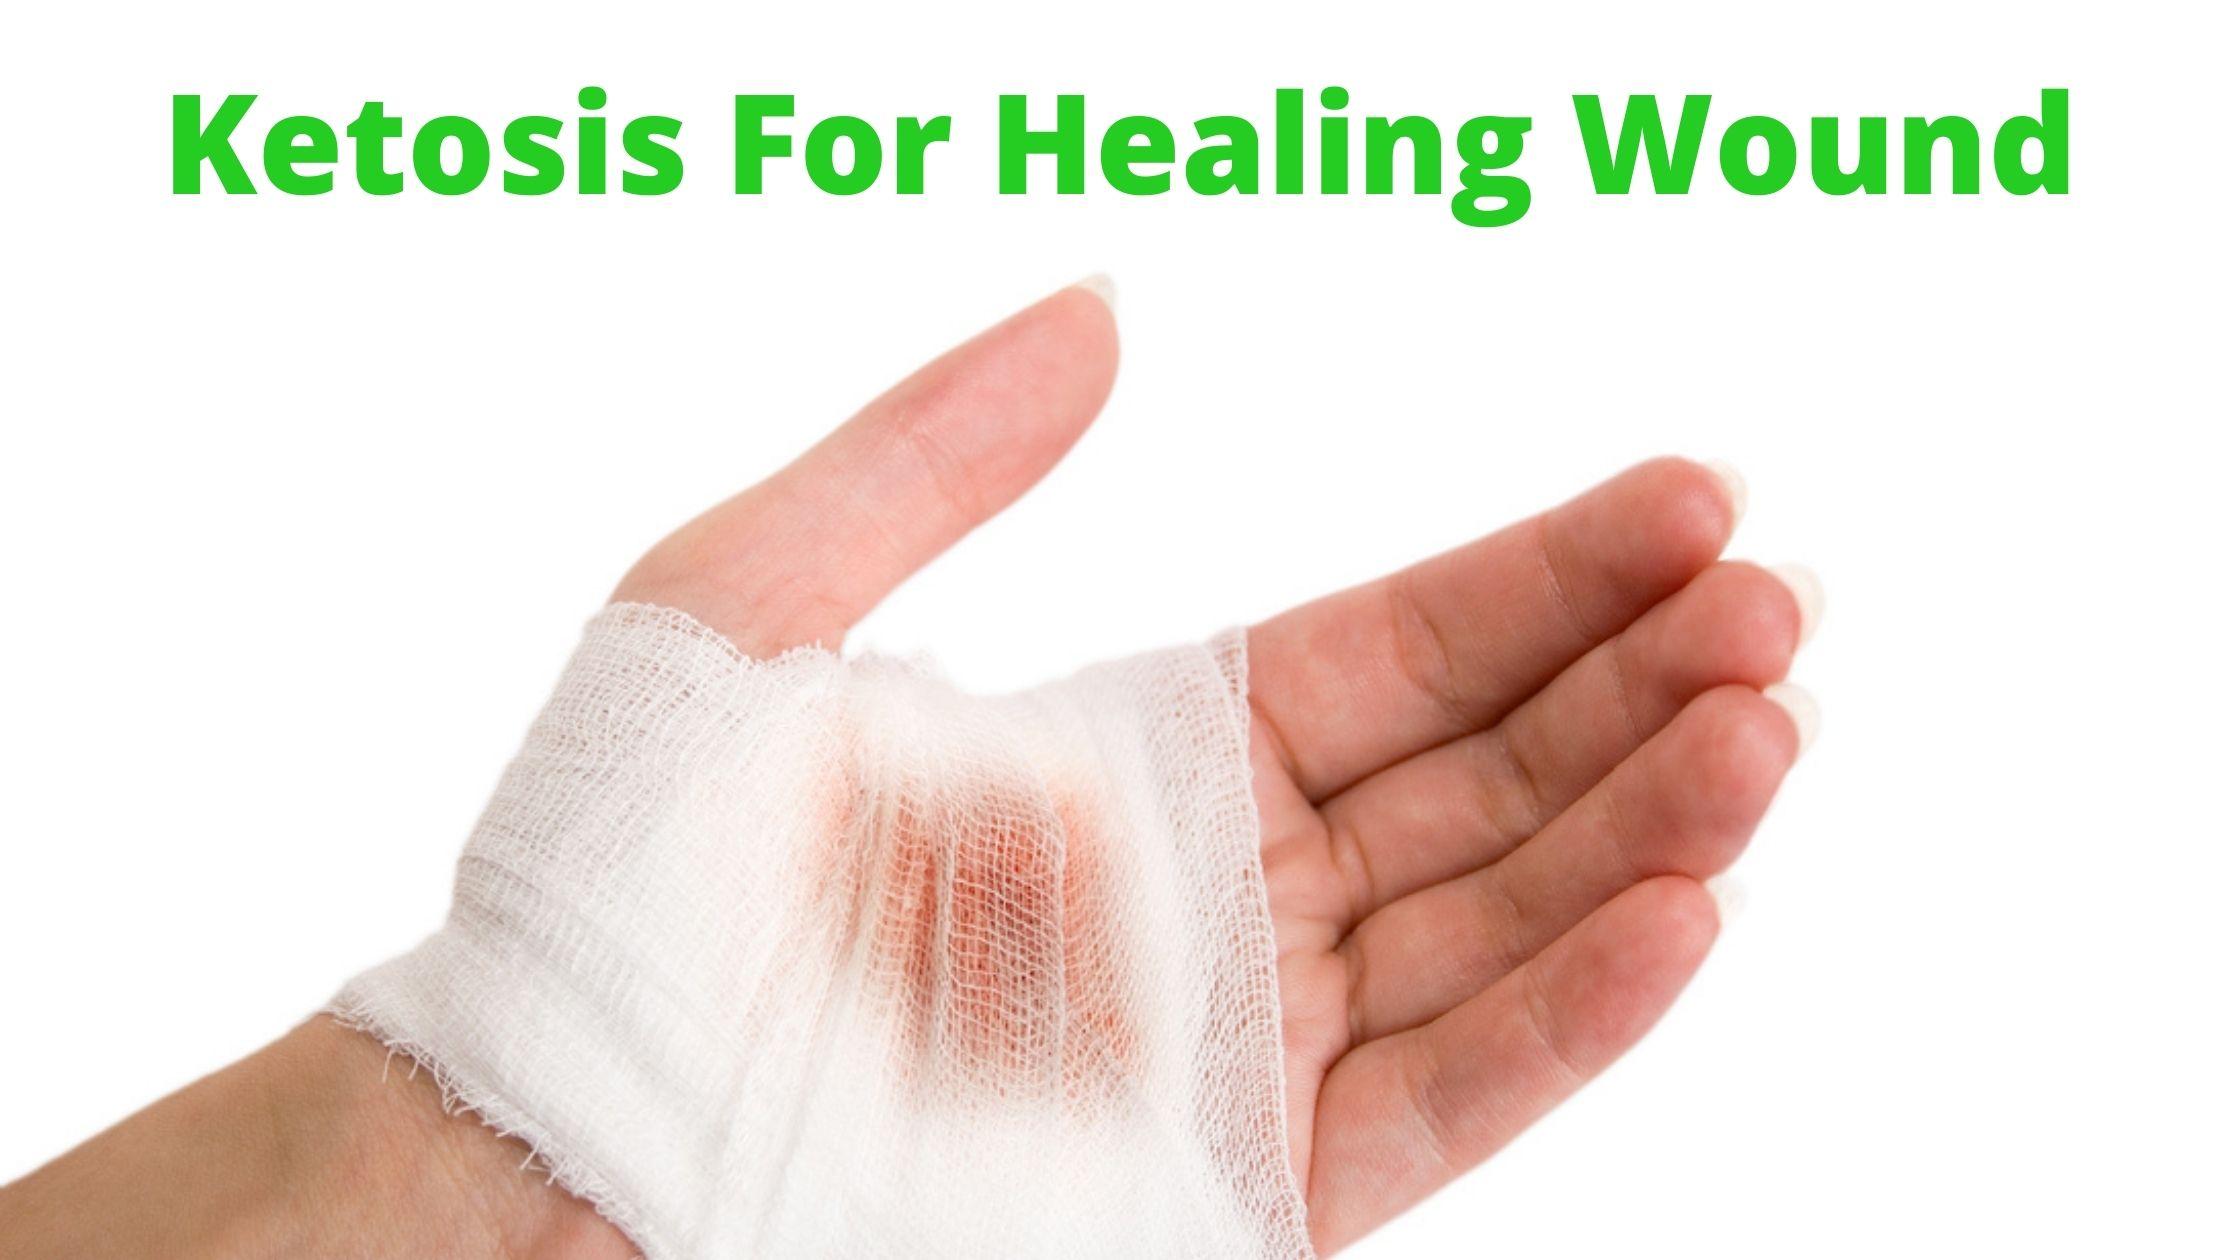 Ketosis promotes rapid wound healing